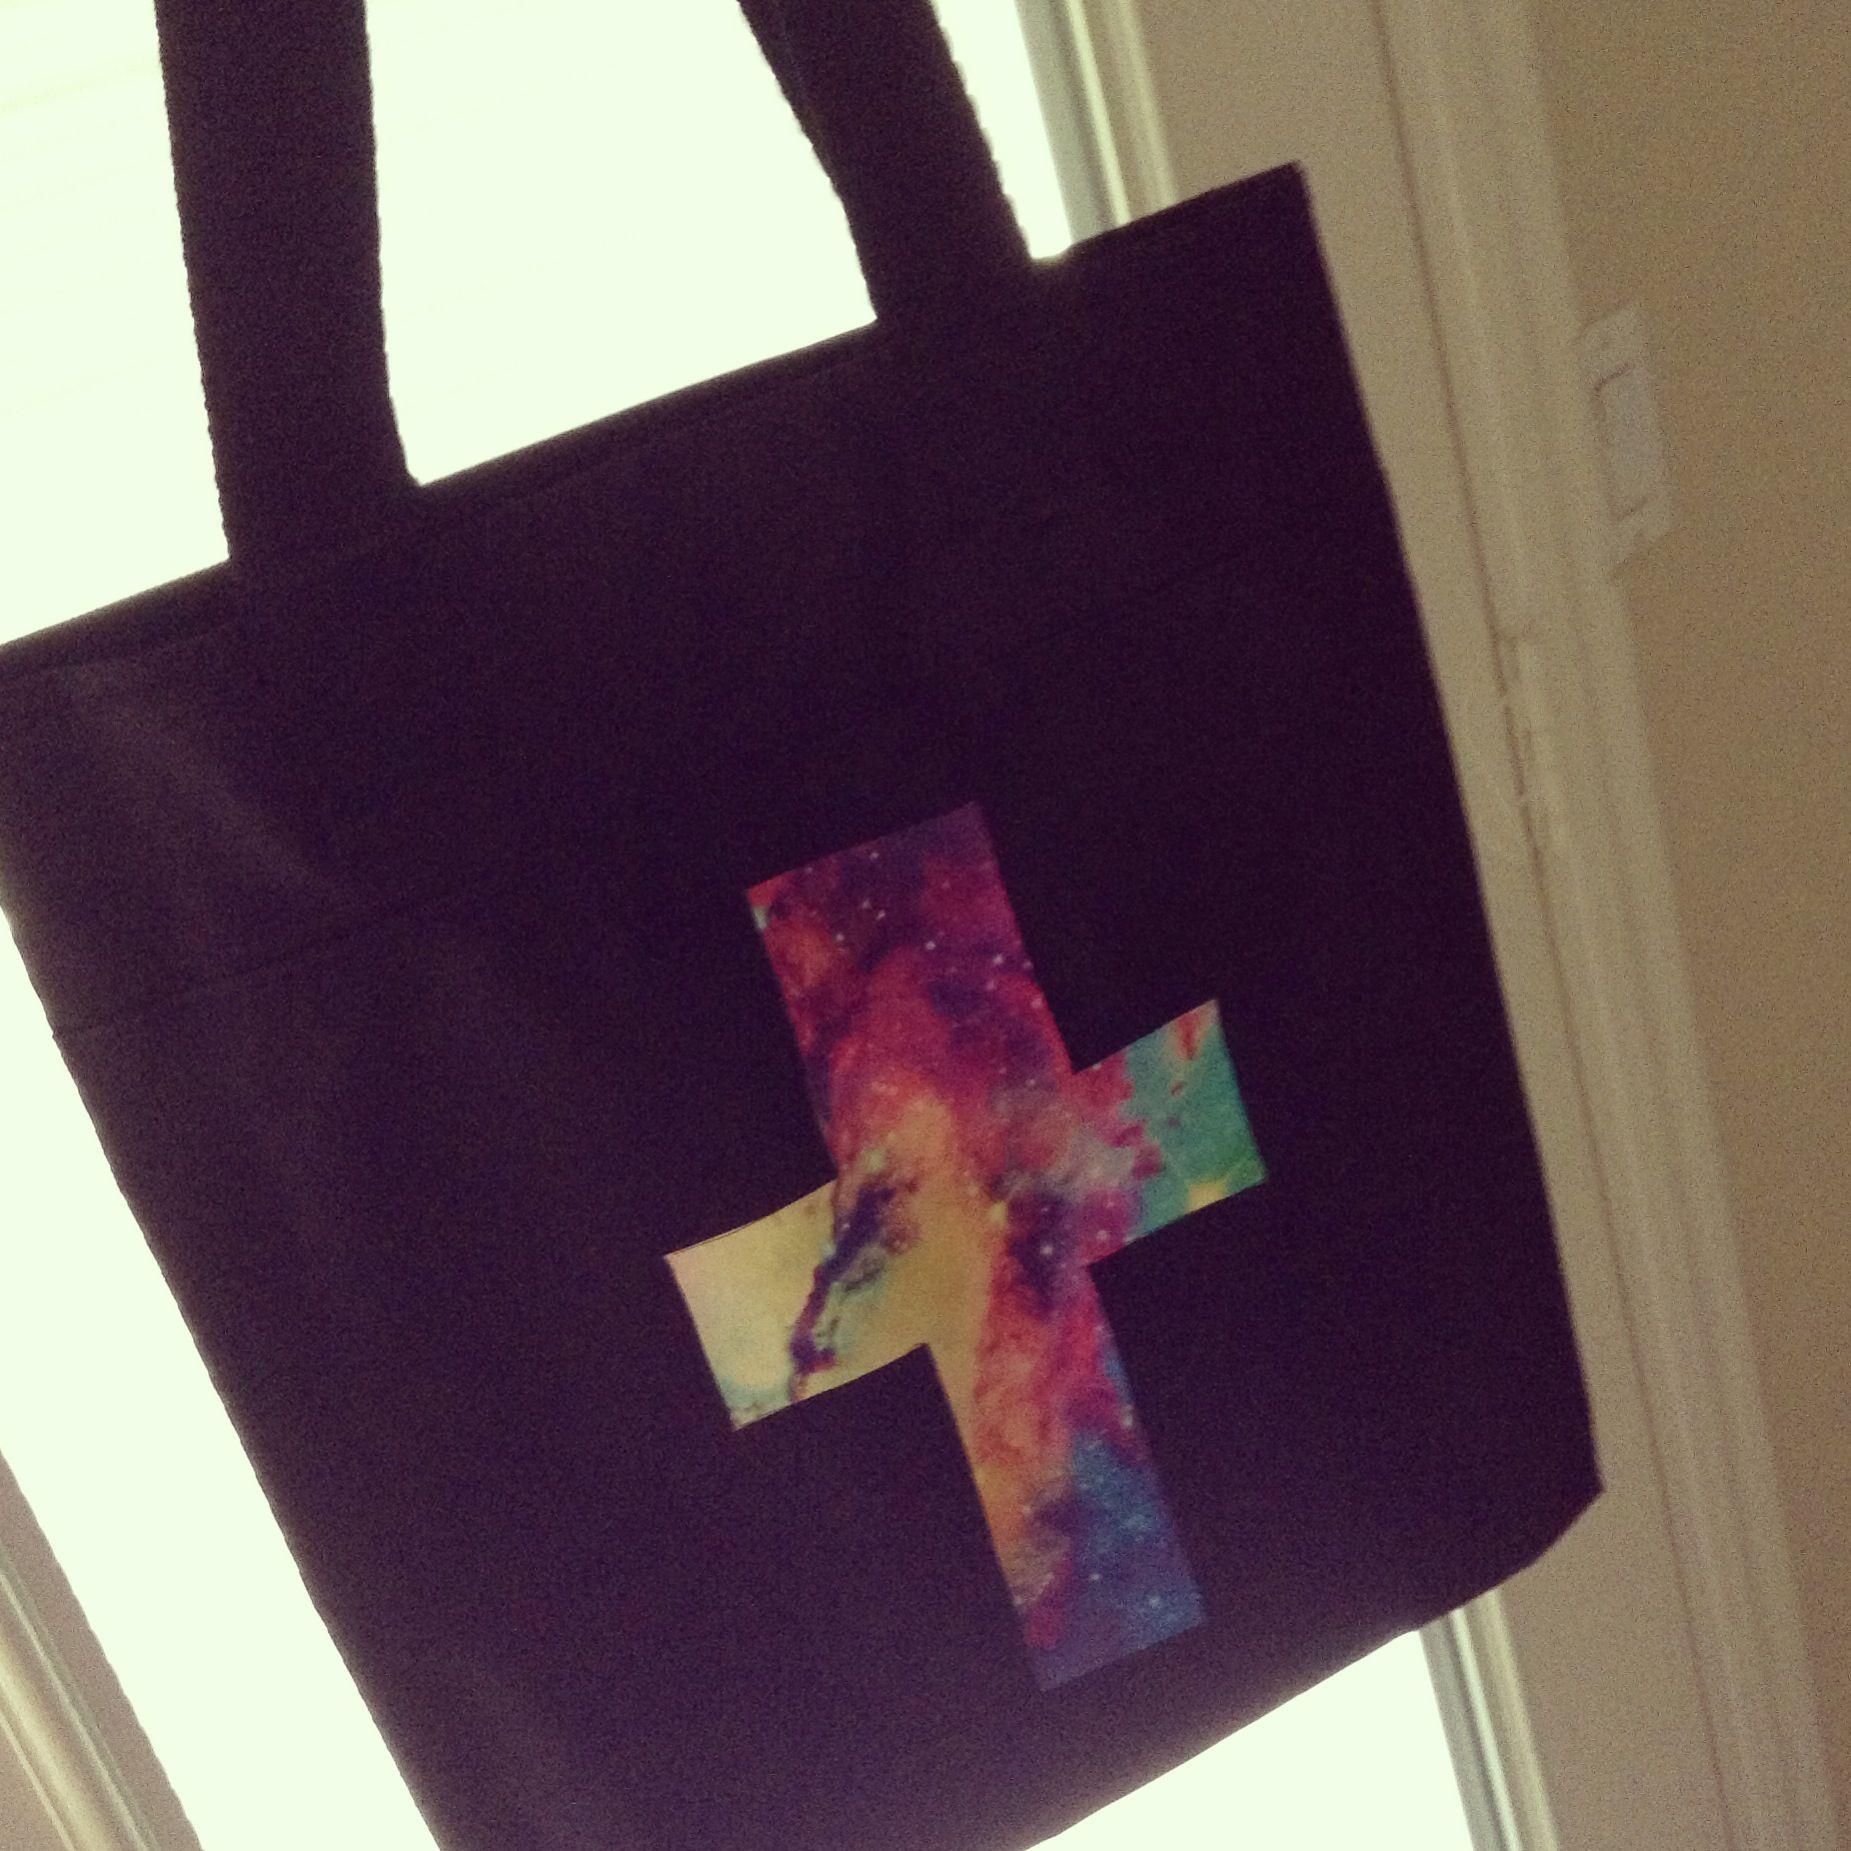 DIY galaxy cross purse  Materials  Blank canvas bag Dark fabric transfers   Printout galaxy print  Cut out a cross iron it onto bag